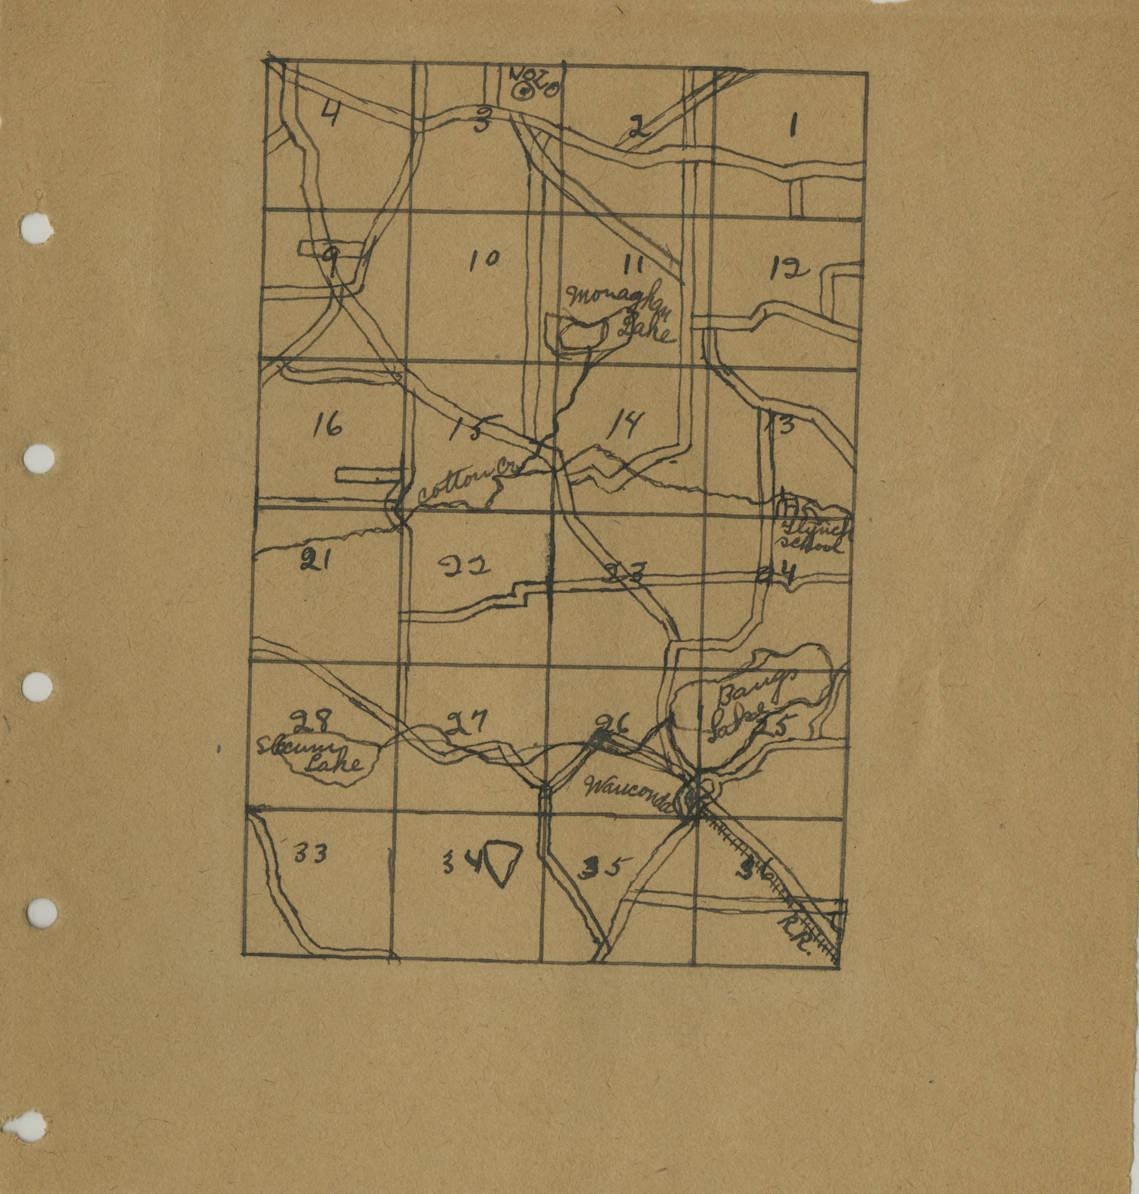 C:\Users\Vern\Documents\Fort Hill\1918 Schools Centennial\1918 Wauconda Twp Glynch School\1918_School_Histories__Wauconda_Township__Glynch_School_2003045_Page_11.jpg